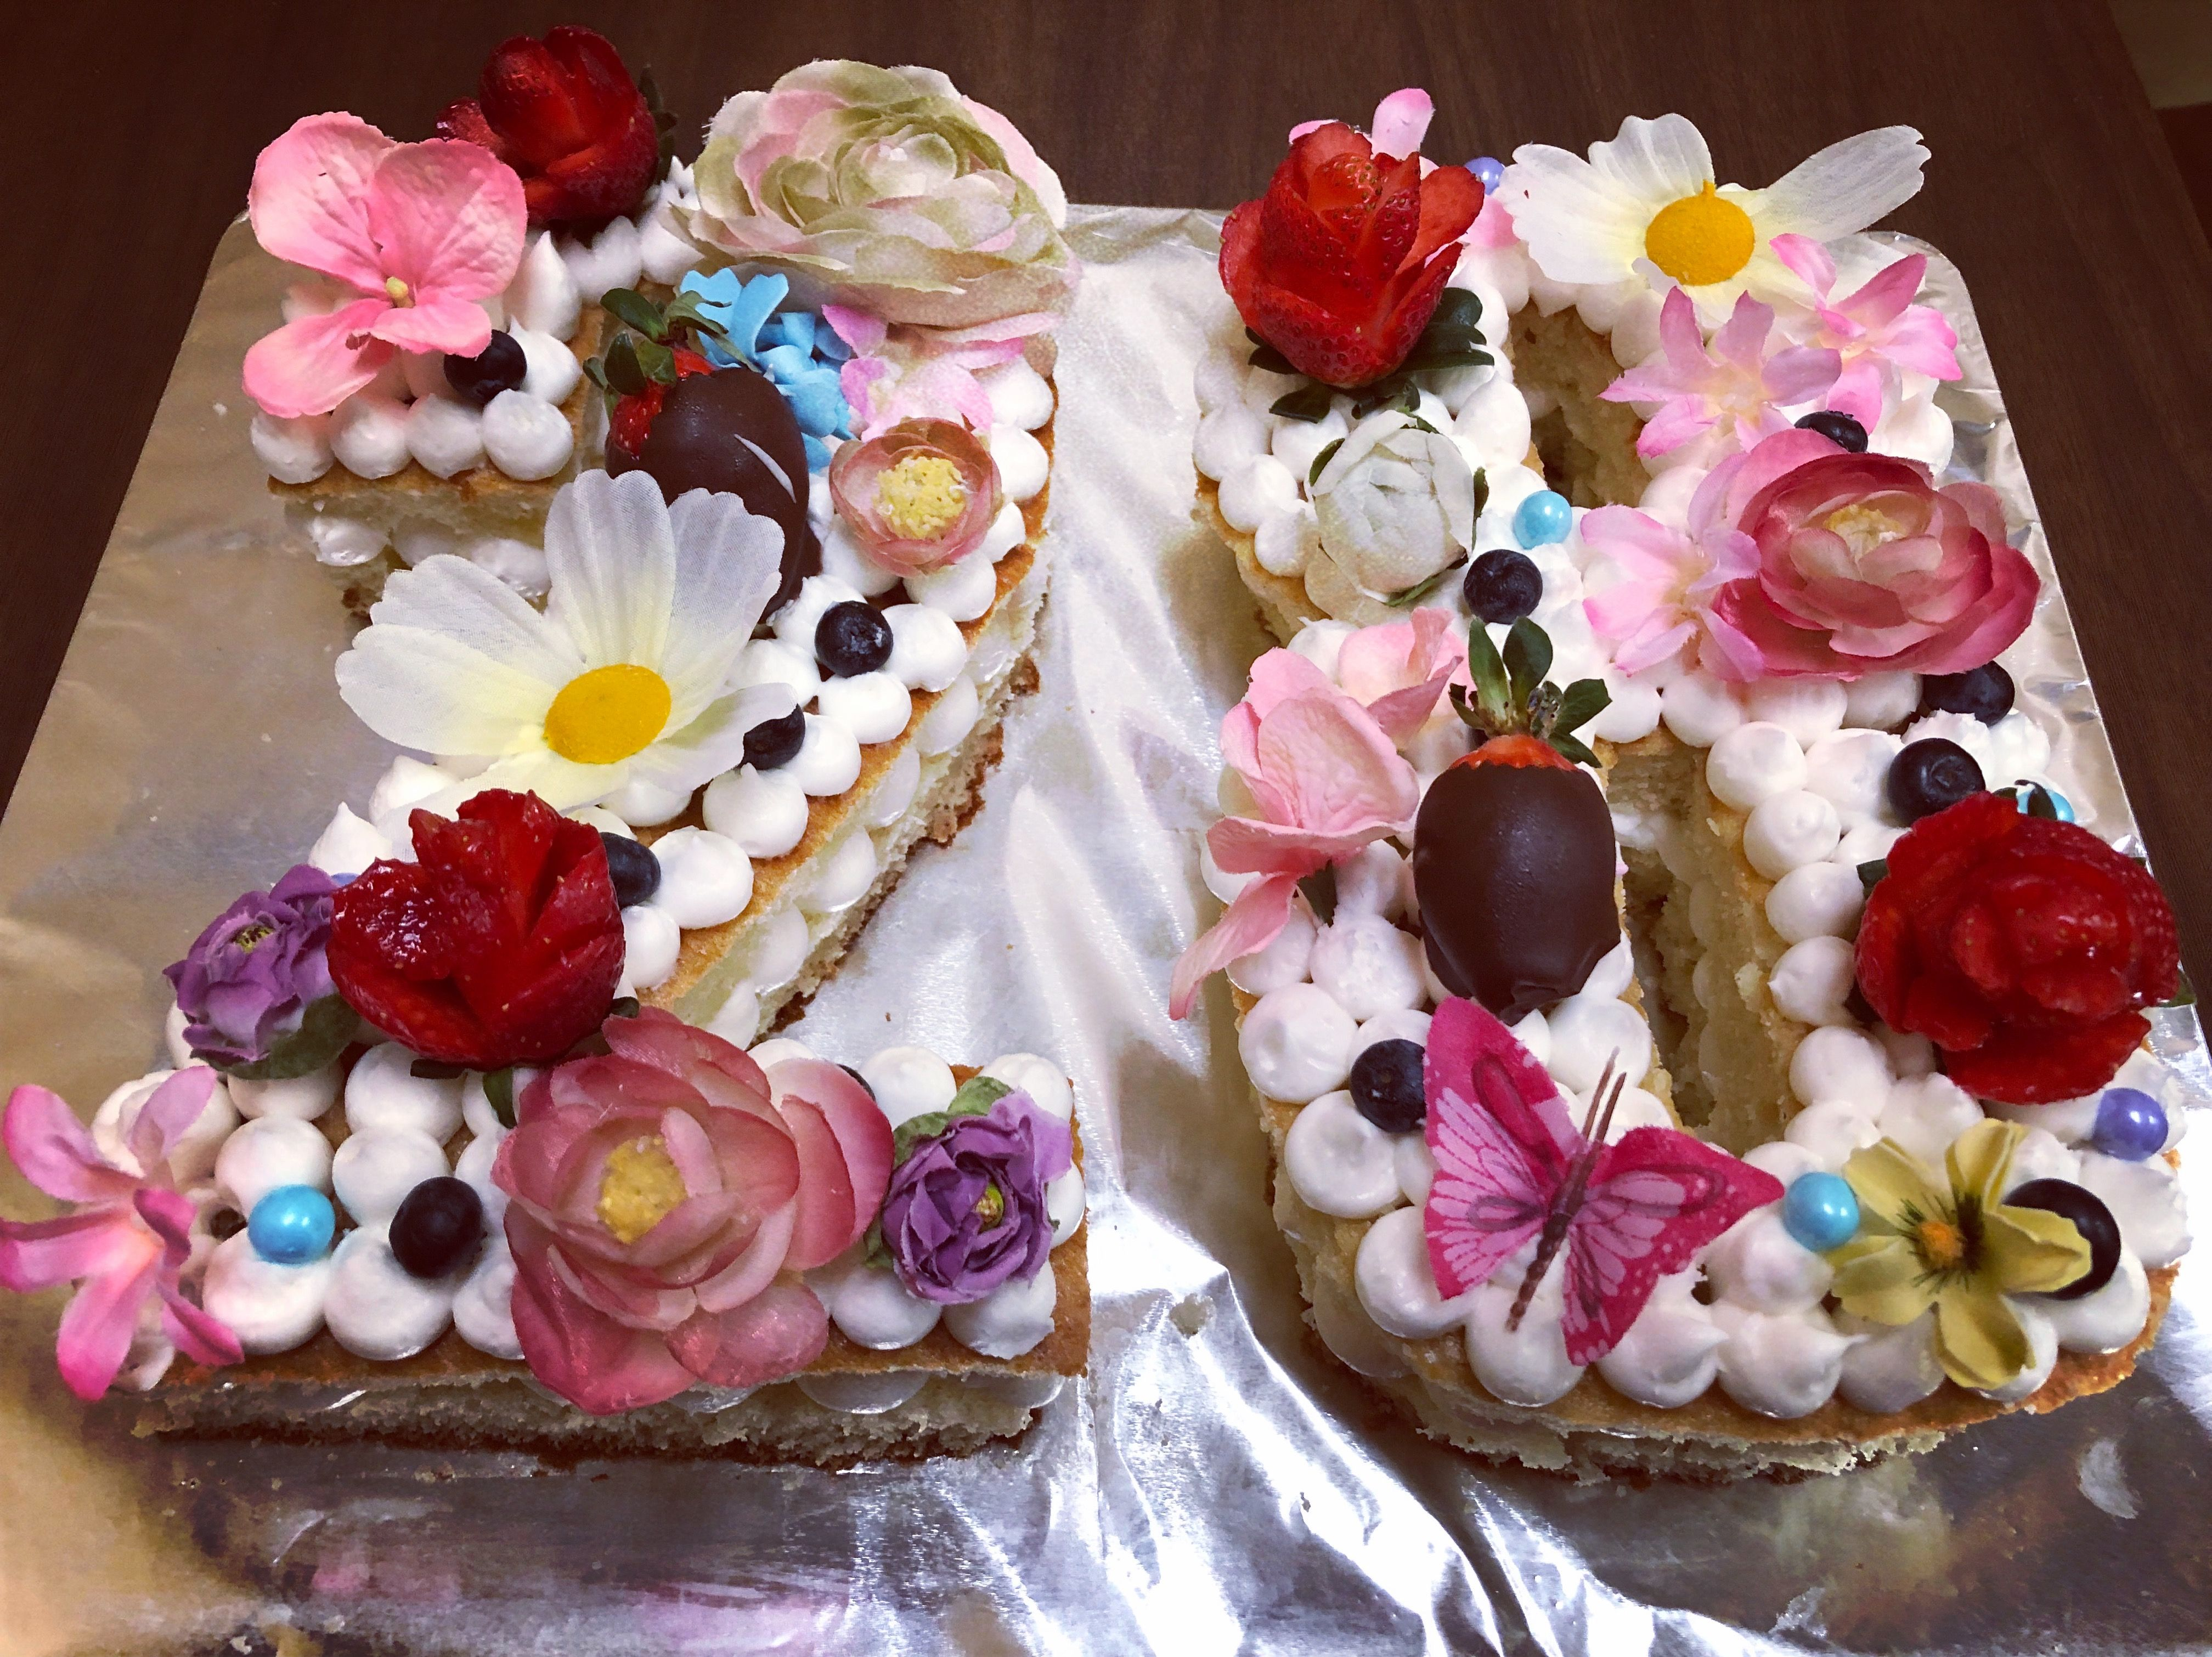 Sensational 28 Birthday Cake With Images 28Th Birthday Cake Macaron Birthday Cards Printable Inklcafe Filternl